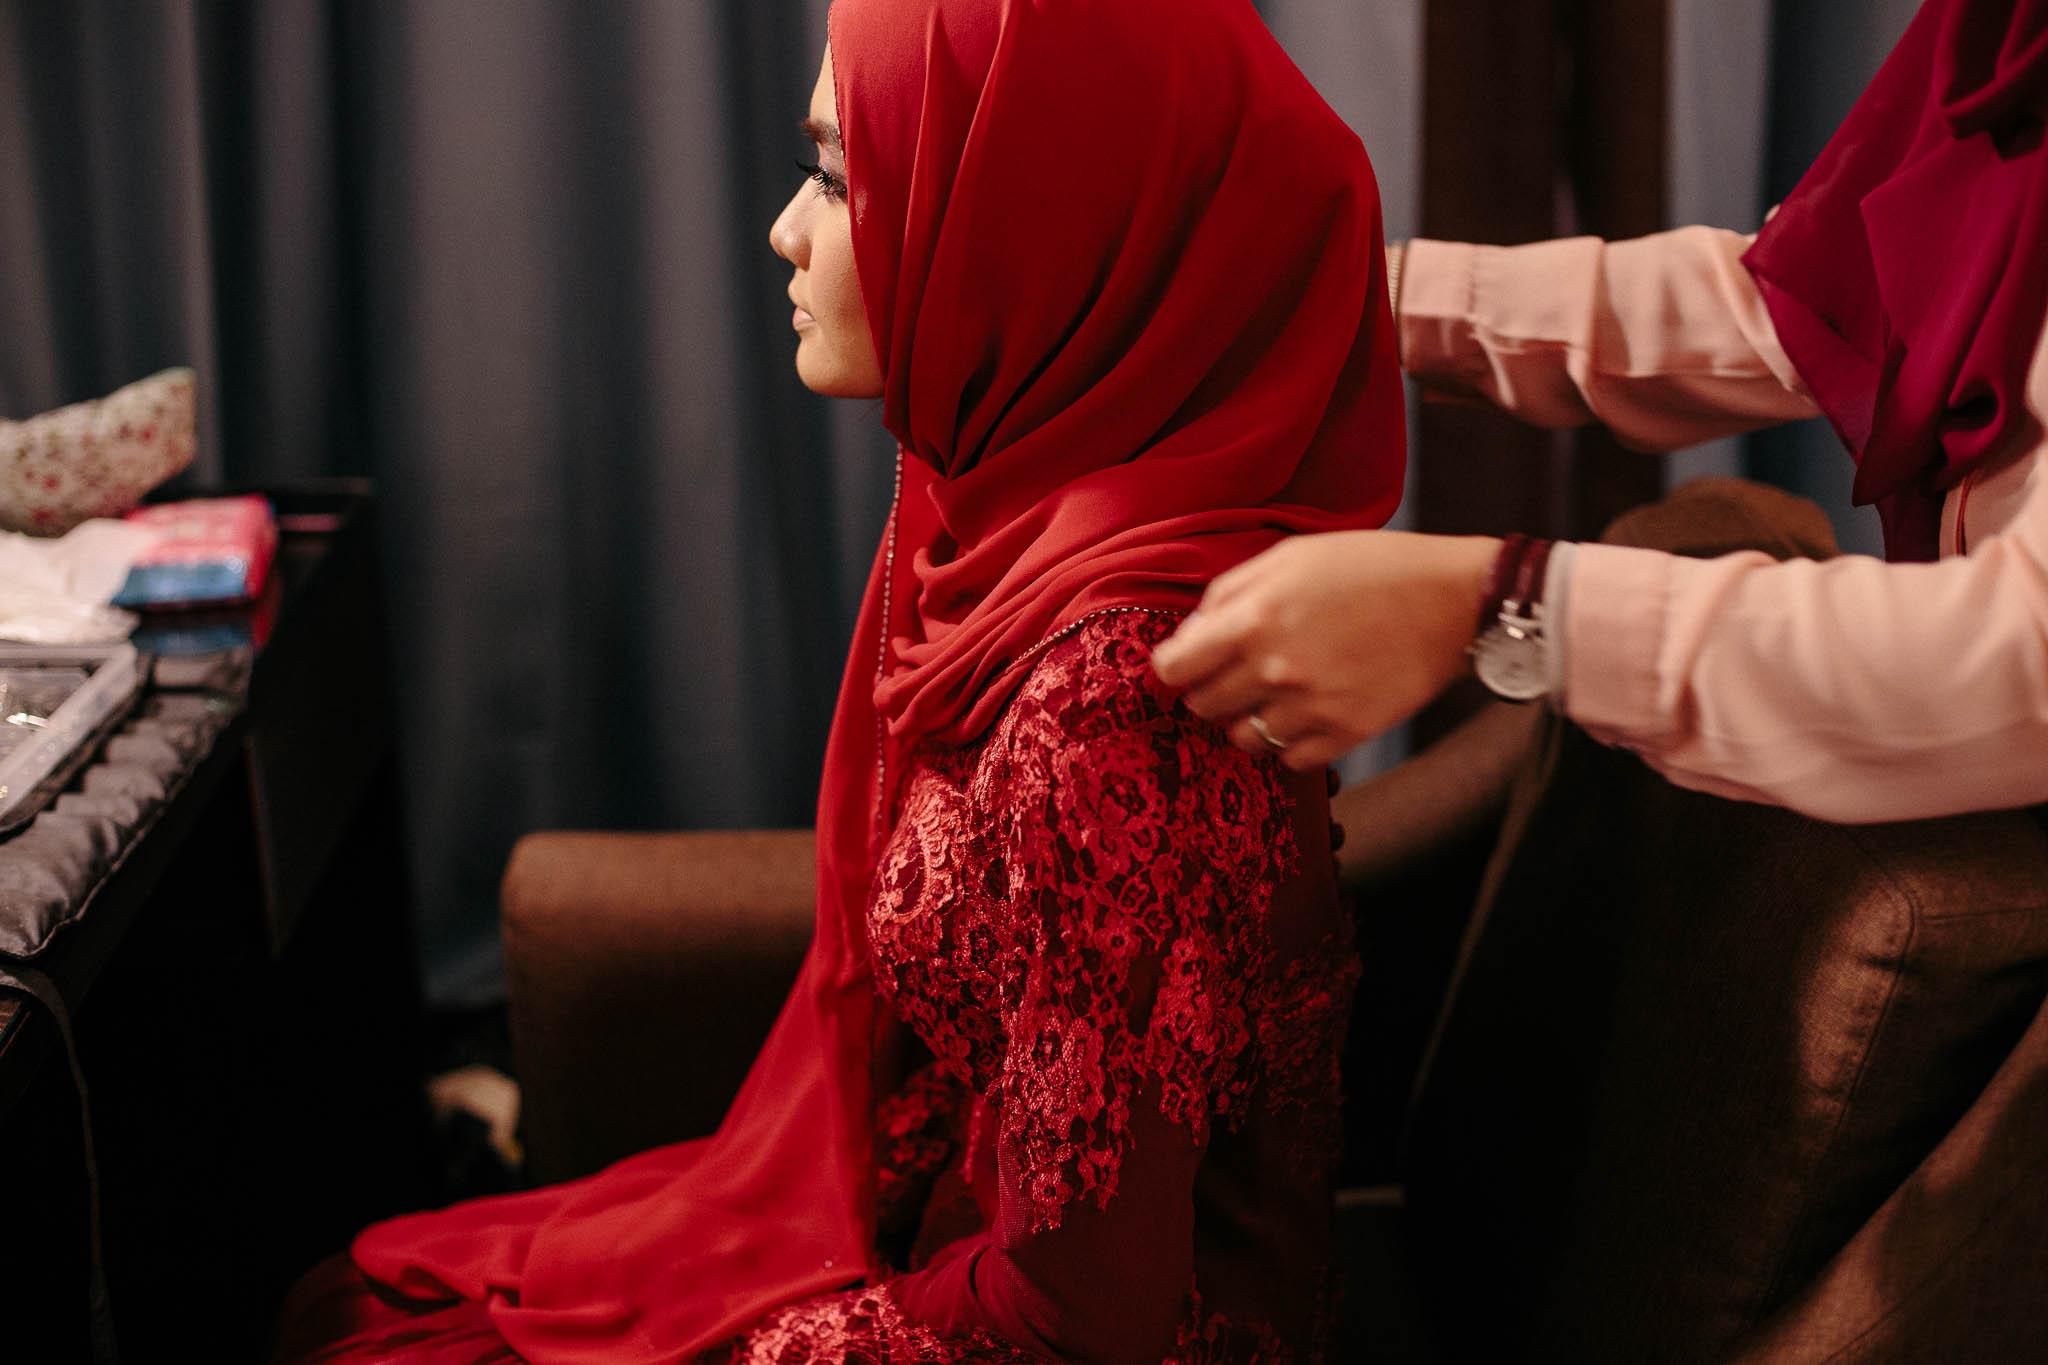 singapore-wedding-photographer-sharalyn-syazwan-057.jpg